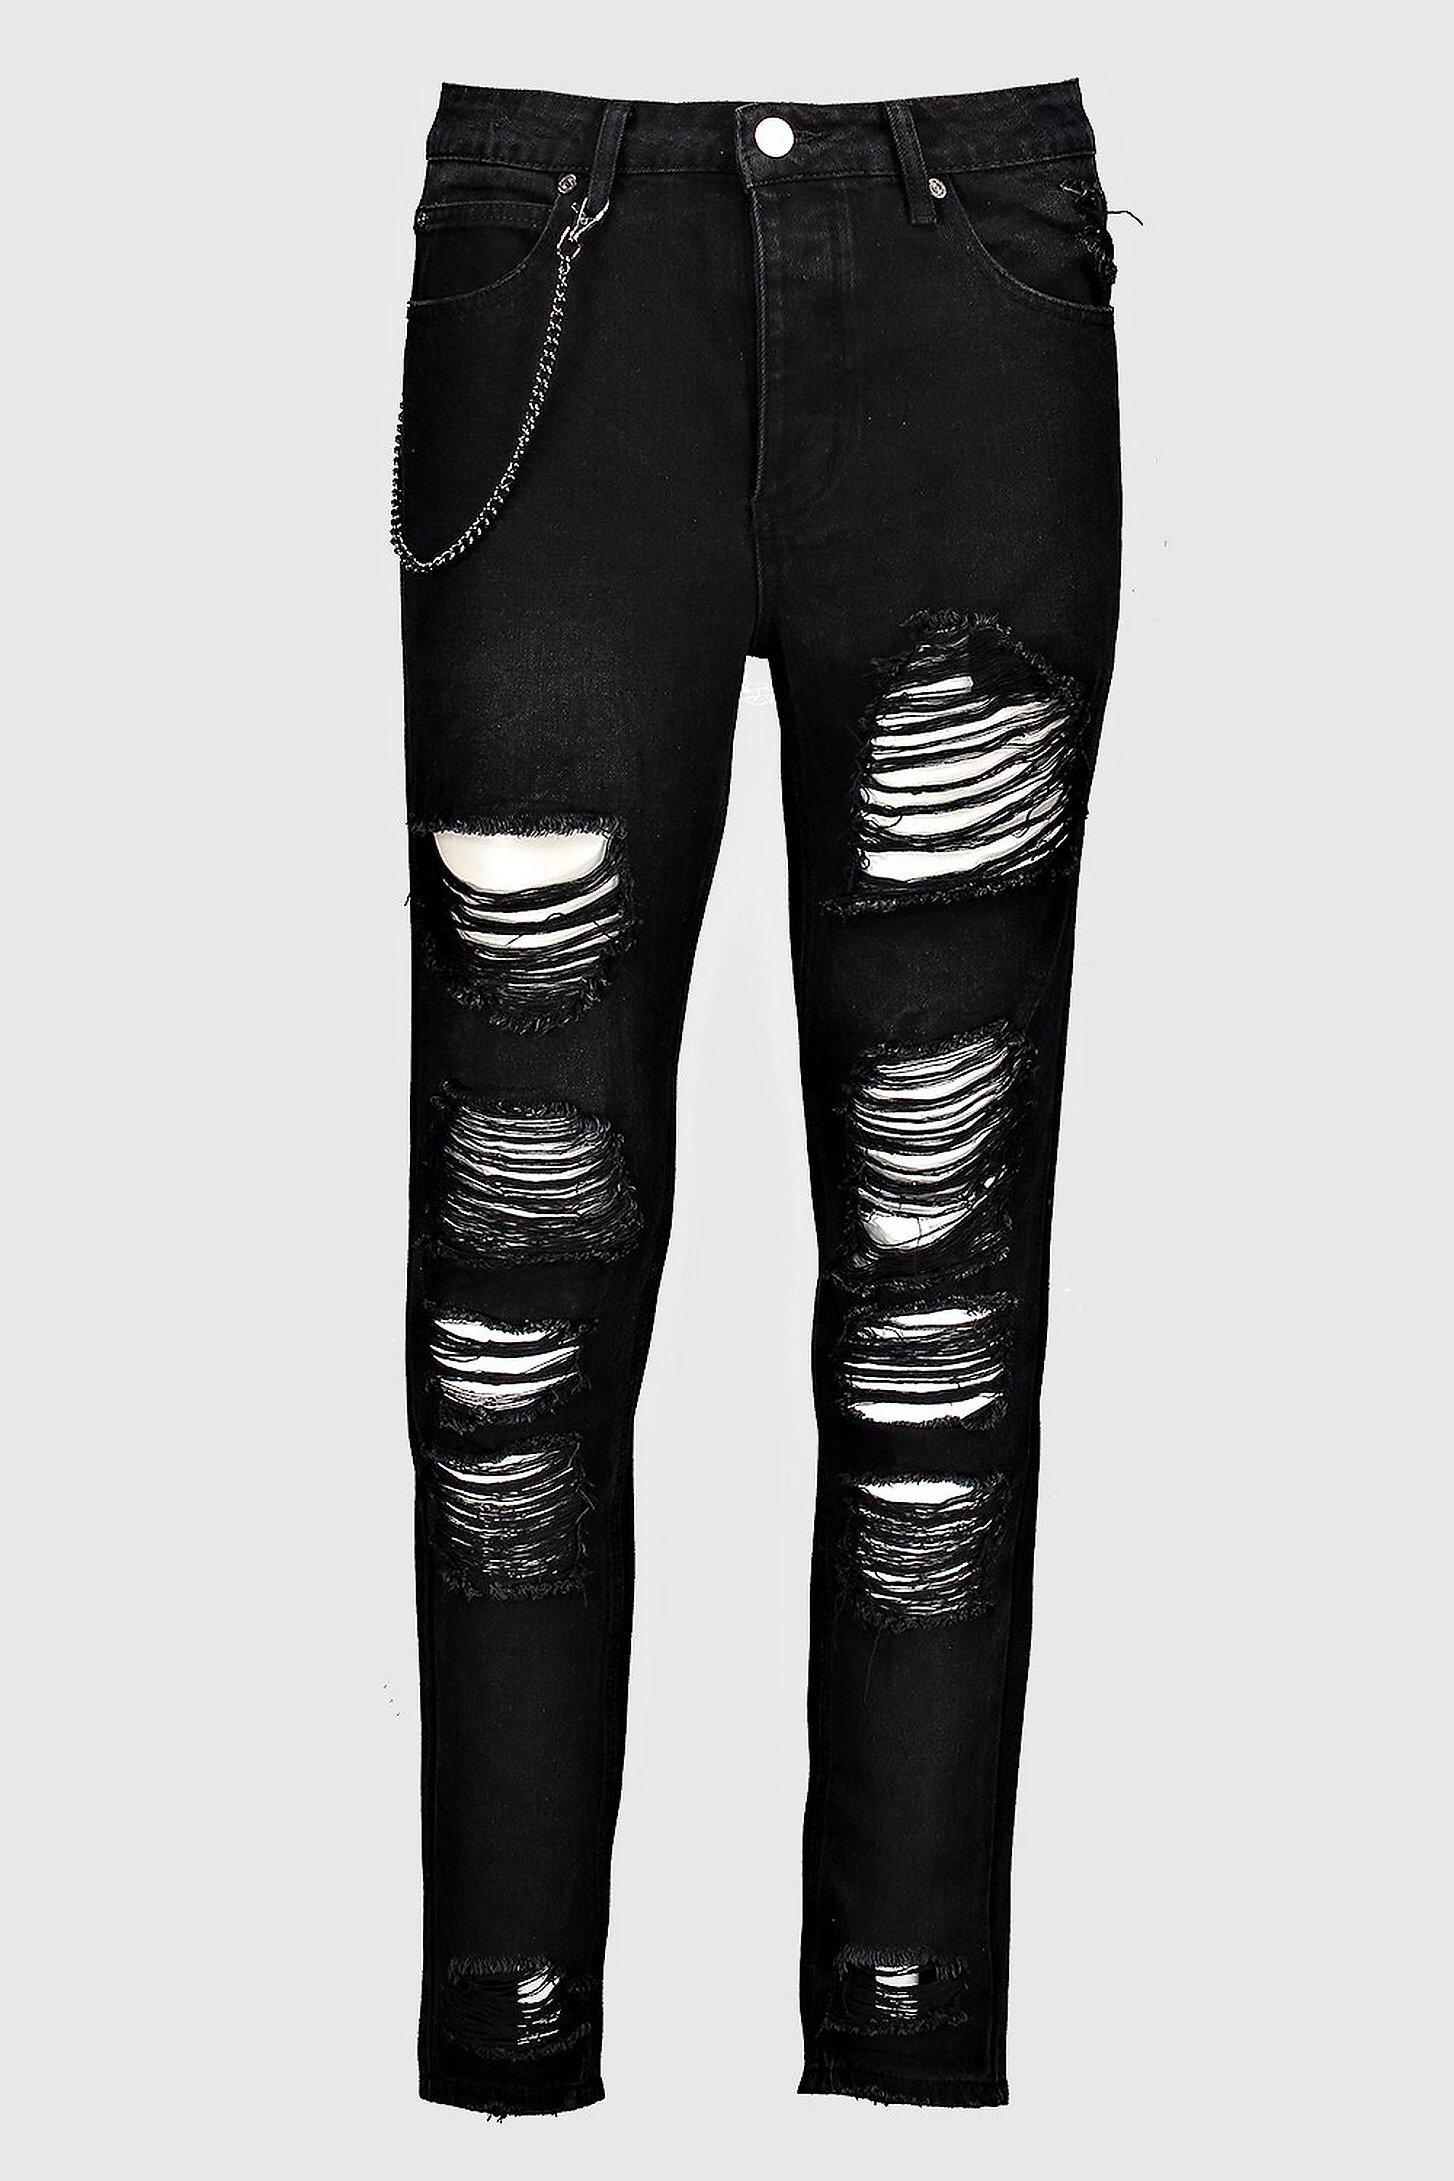 Men's Black Ripped Skinny Jeans